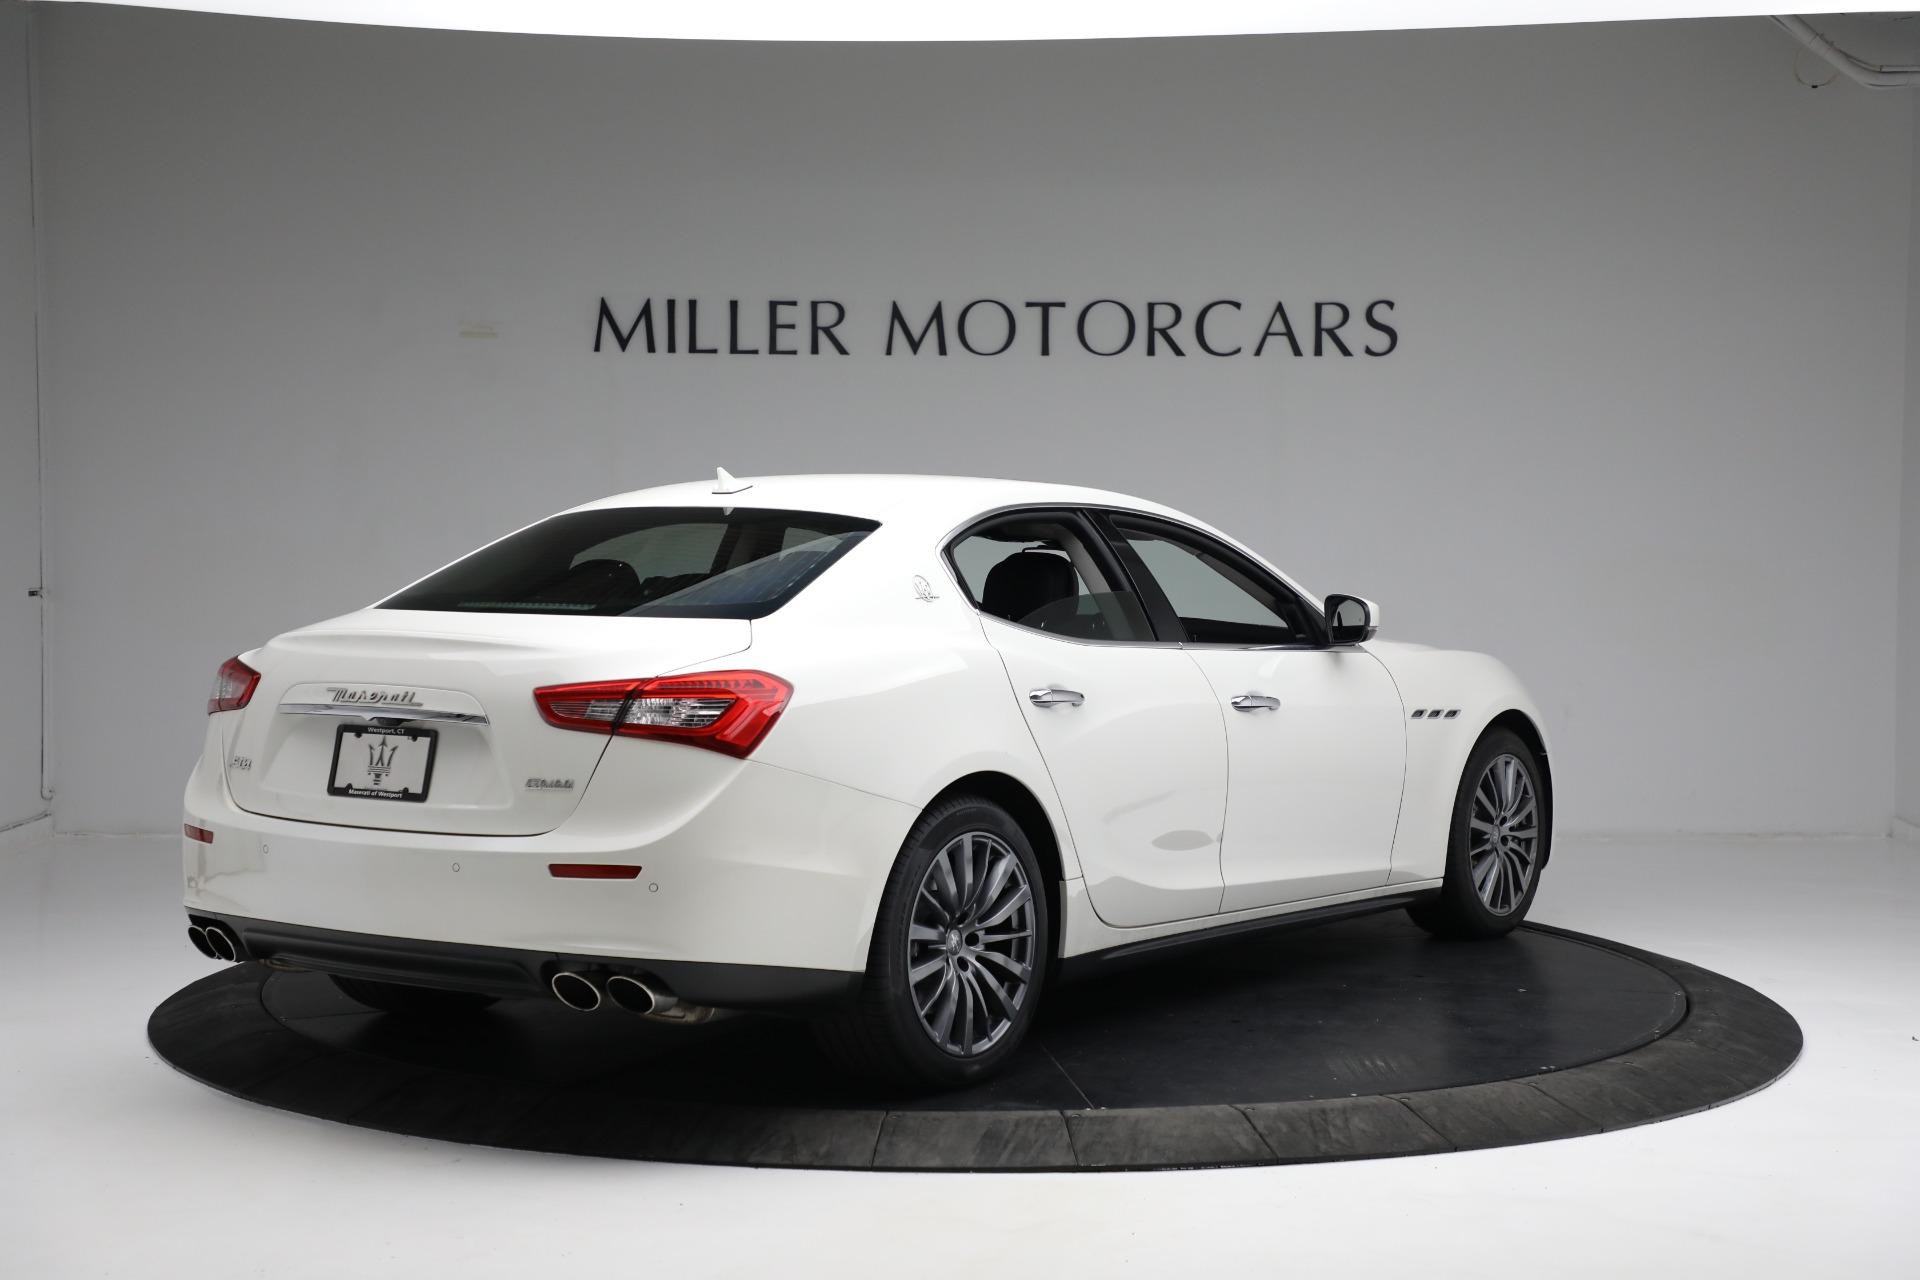 New 2017 Maserati Ghibli S Q4 EX-Loaner For Sale In Greenwich, CT 1019_p7